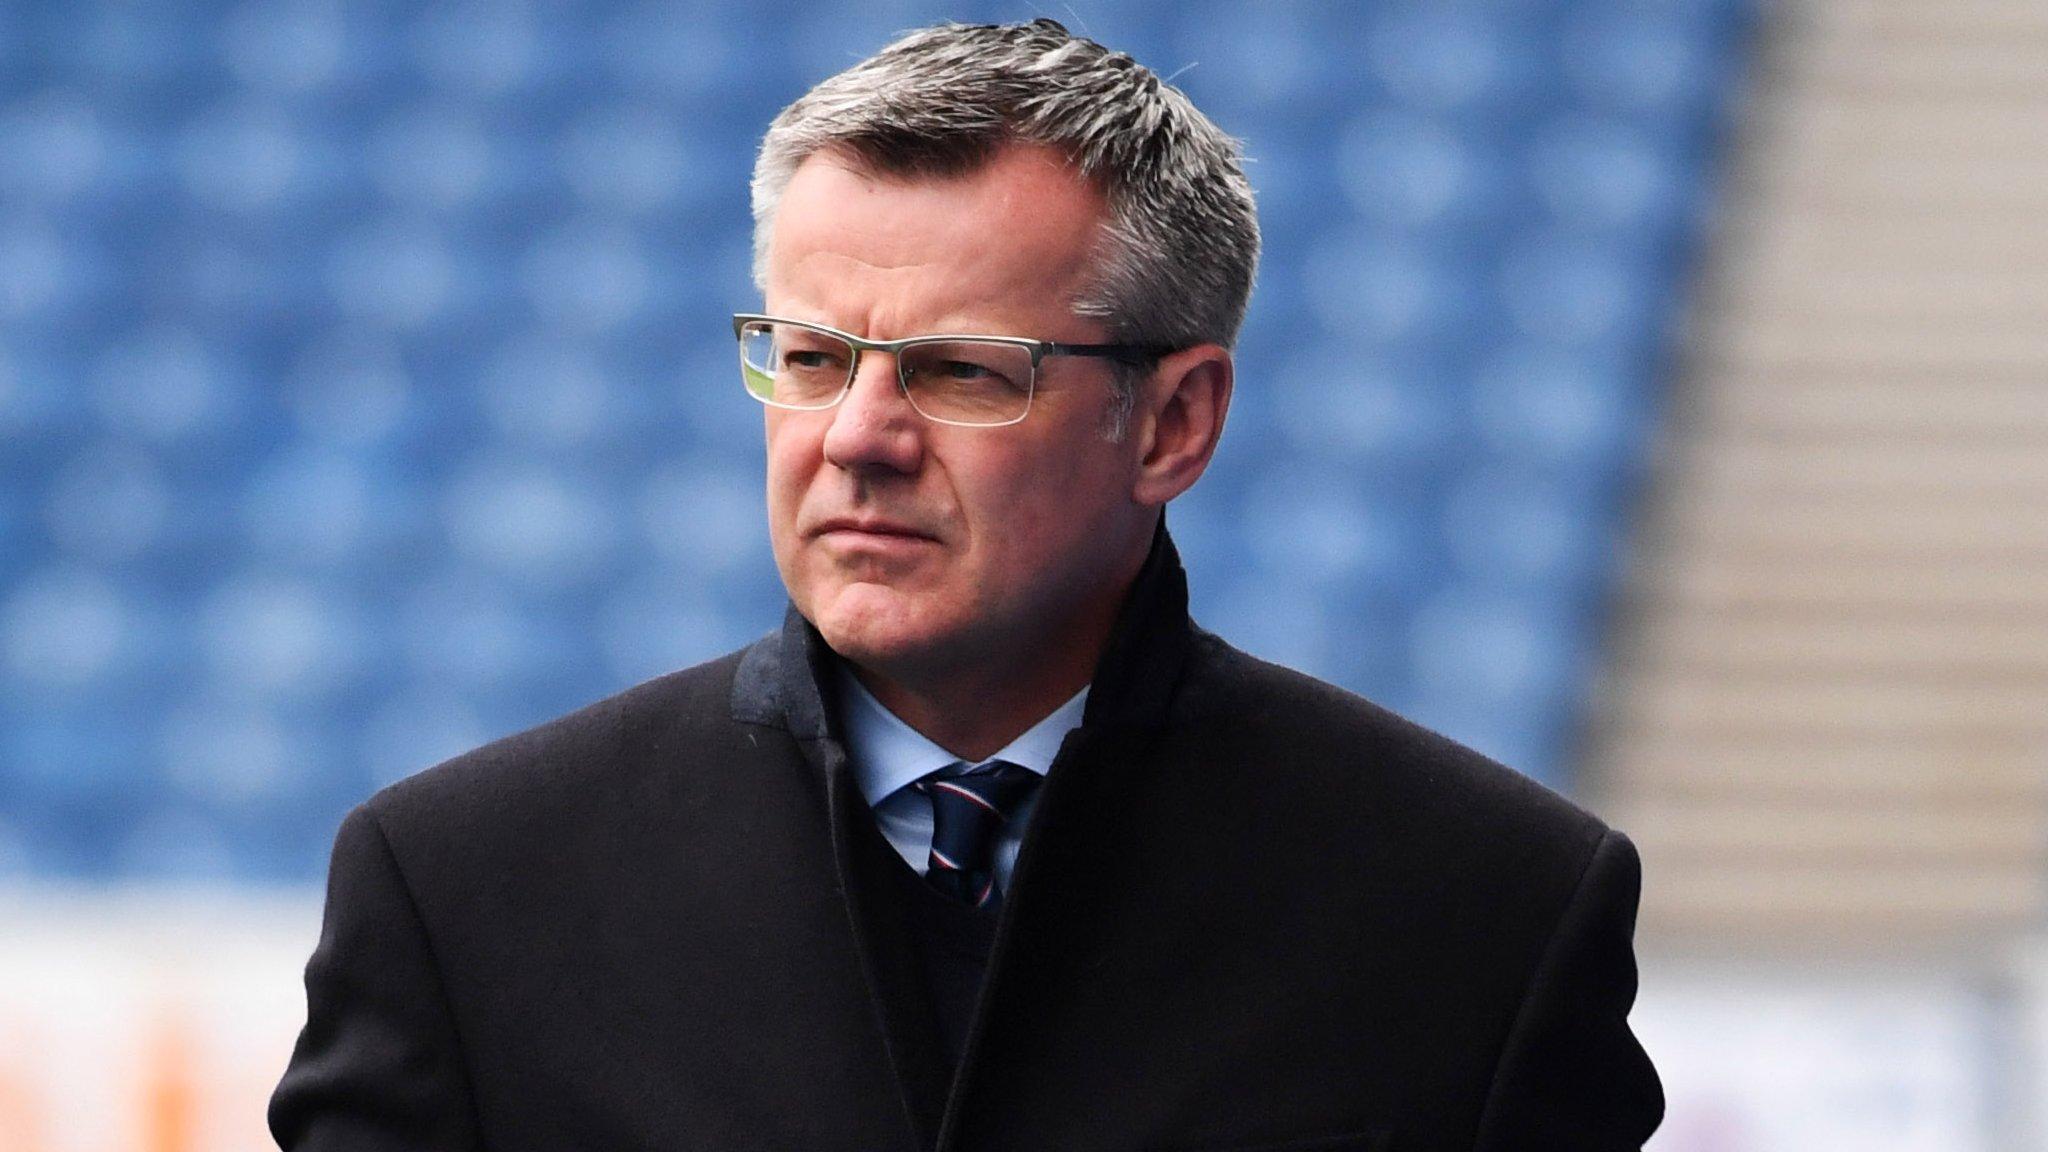 Rangers: Stewart Robertson says SFA disciplinary system needs addressing